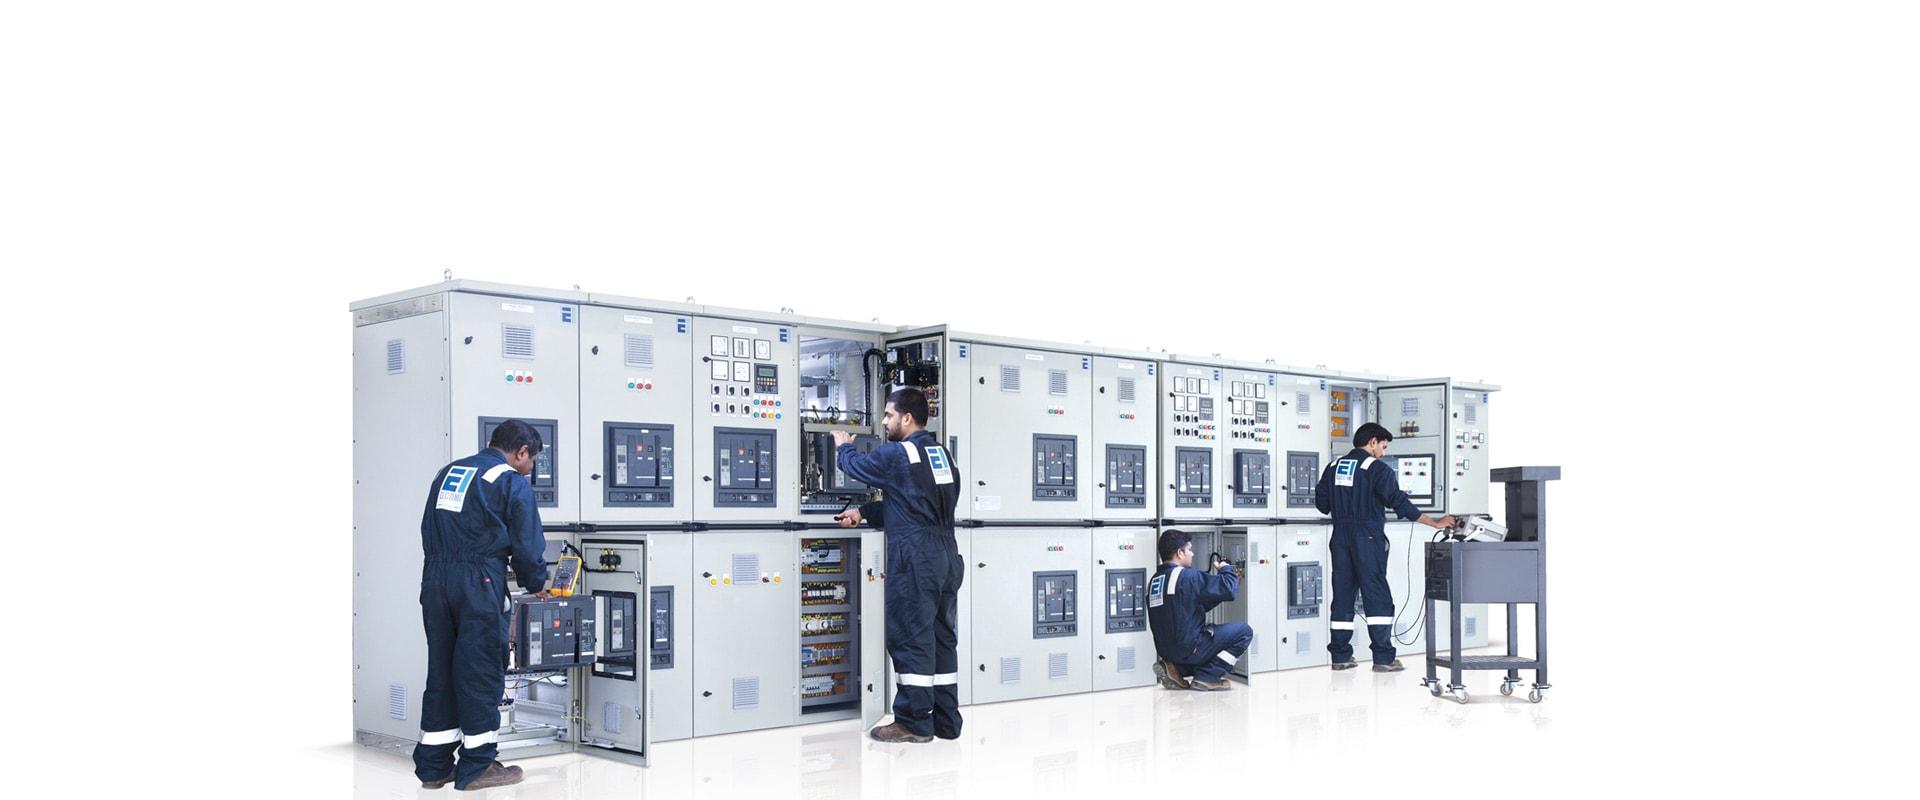 Elcome-ELSYS-Marine-Switchboard-White-1920x800px